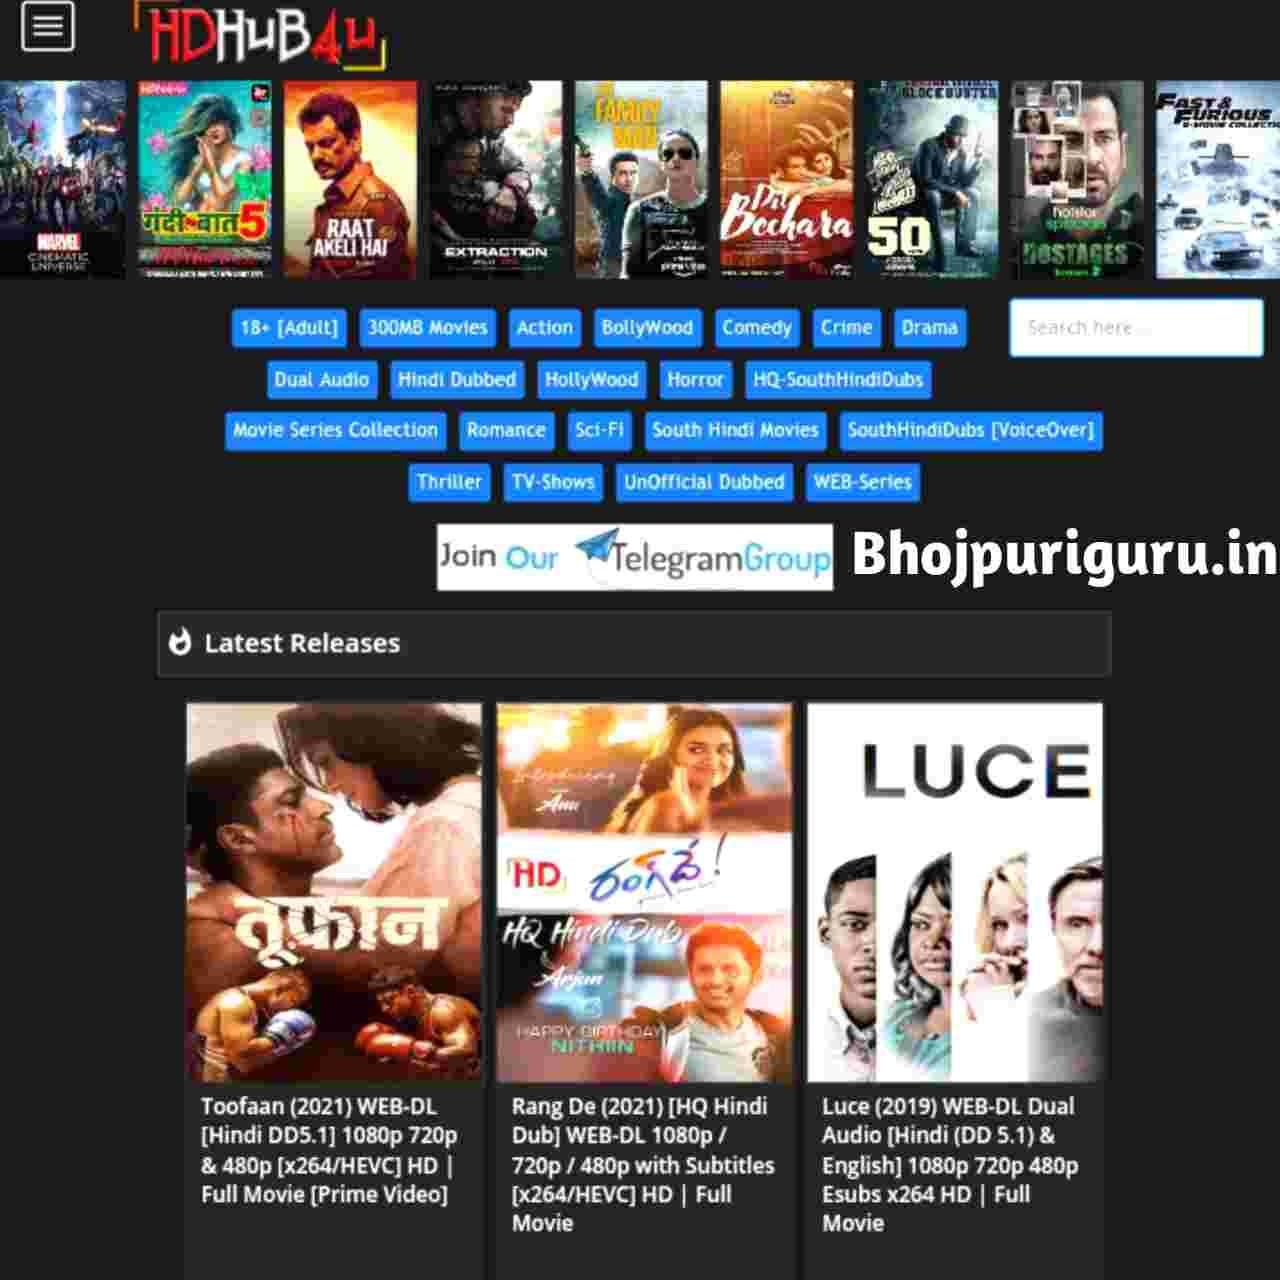 HDHub4u 2021 All Bollywood & Hollywood Movie, Web series, Hindi Dubbed Movies Downloand - Bhojpuri Guru